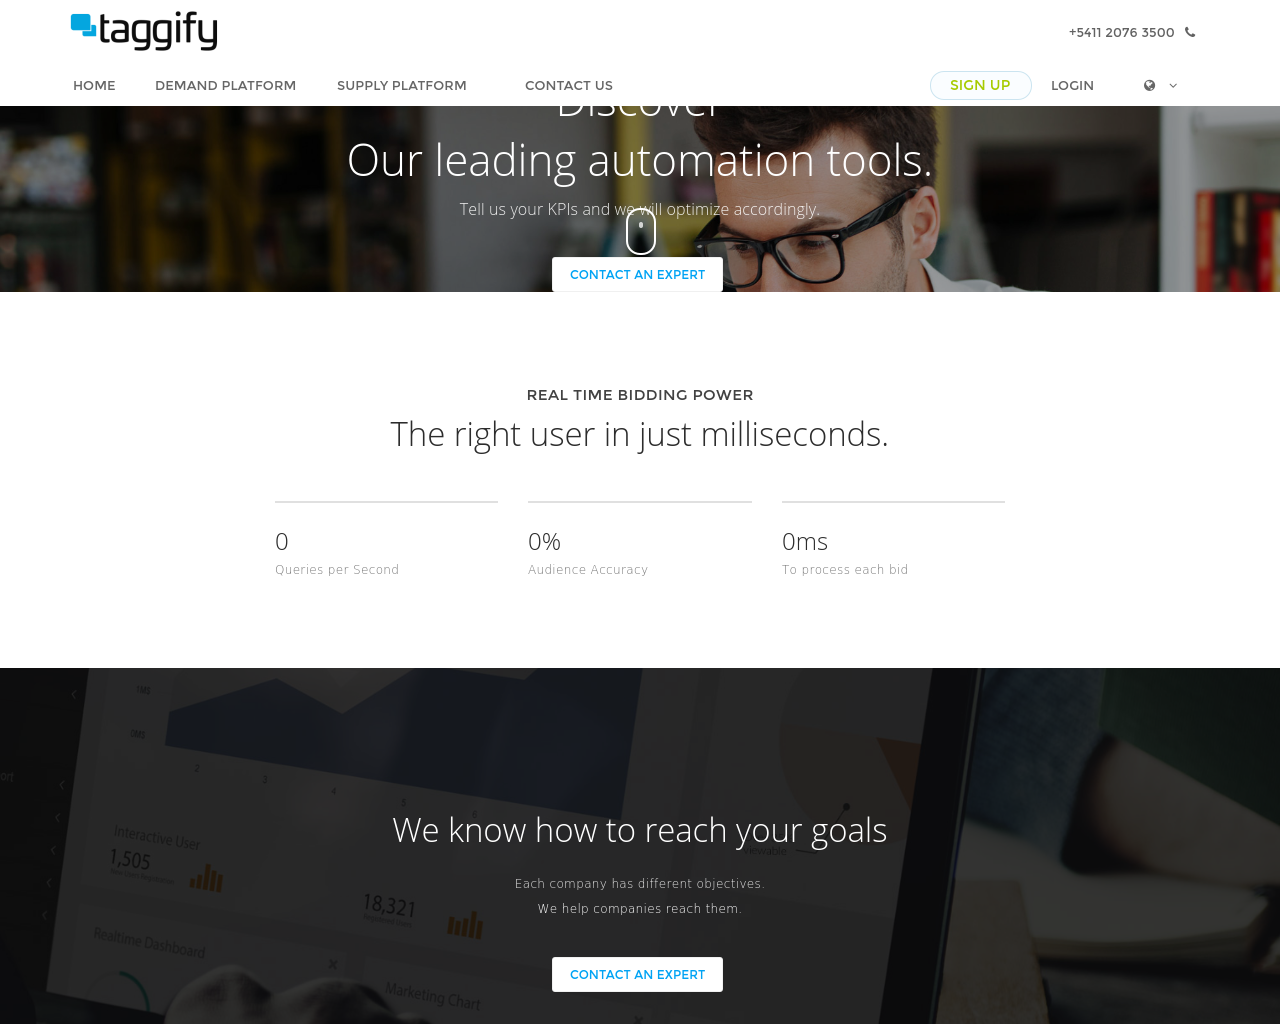 Taggify-Inc.-Advertising-Reviews-Pricing